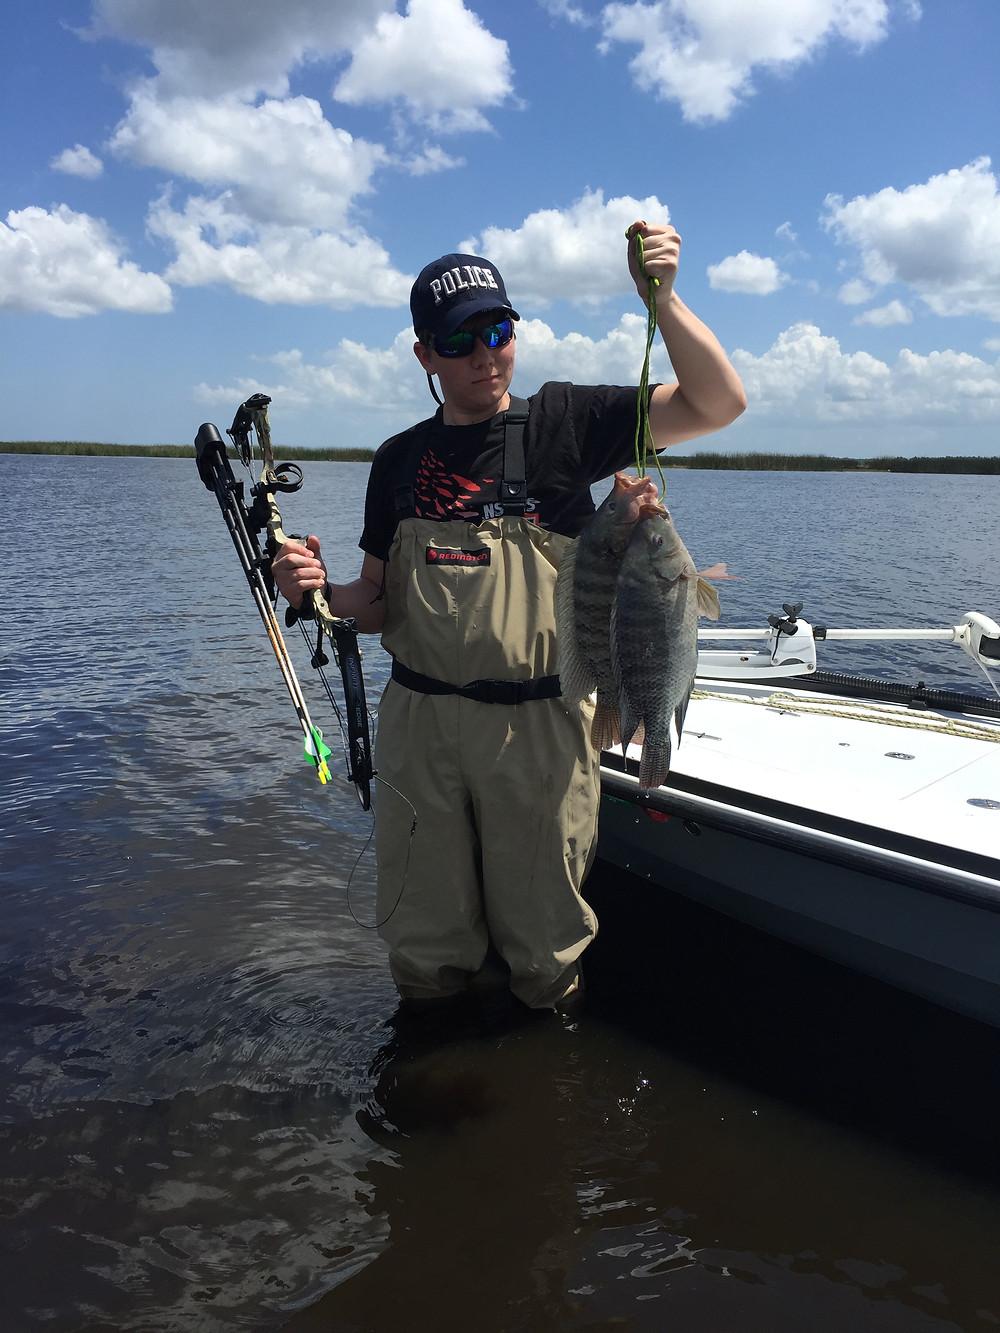 Captain John Tarr Fishing Charters|Tailhunter Outdoor Adventures|Florida|Bowfishing|Tilapia